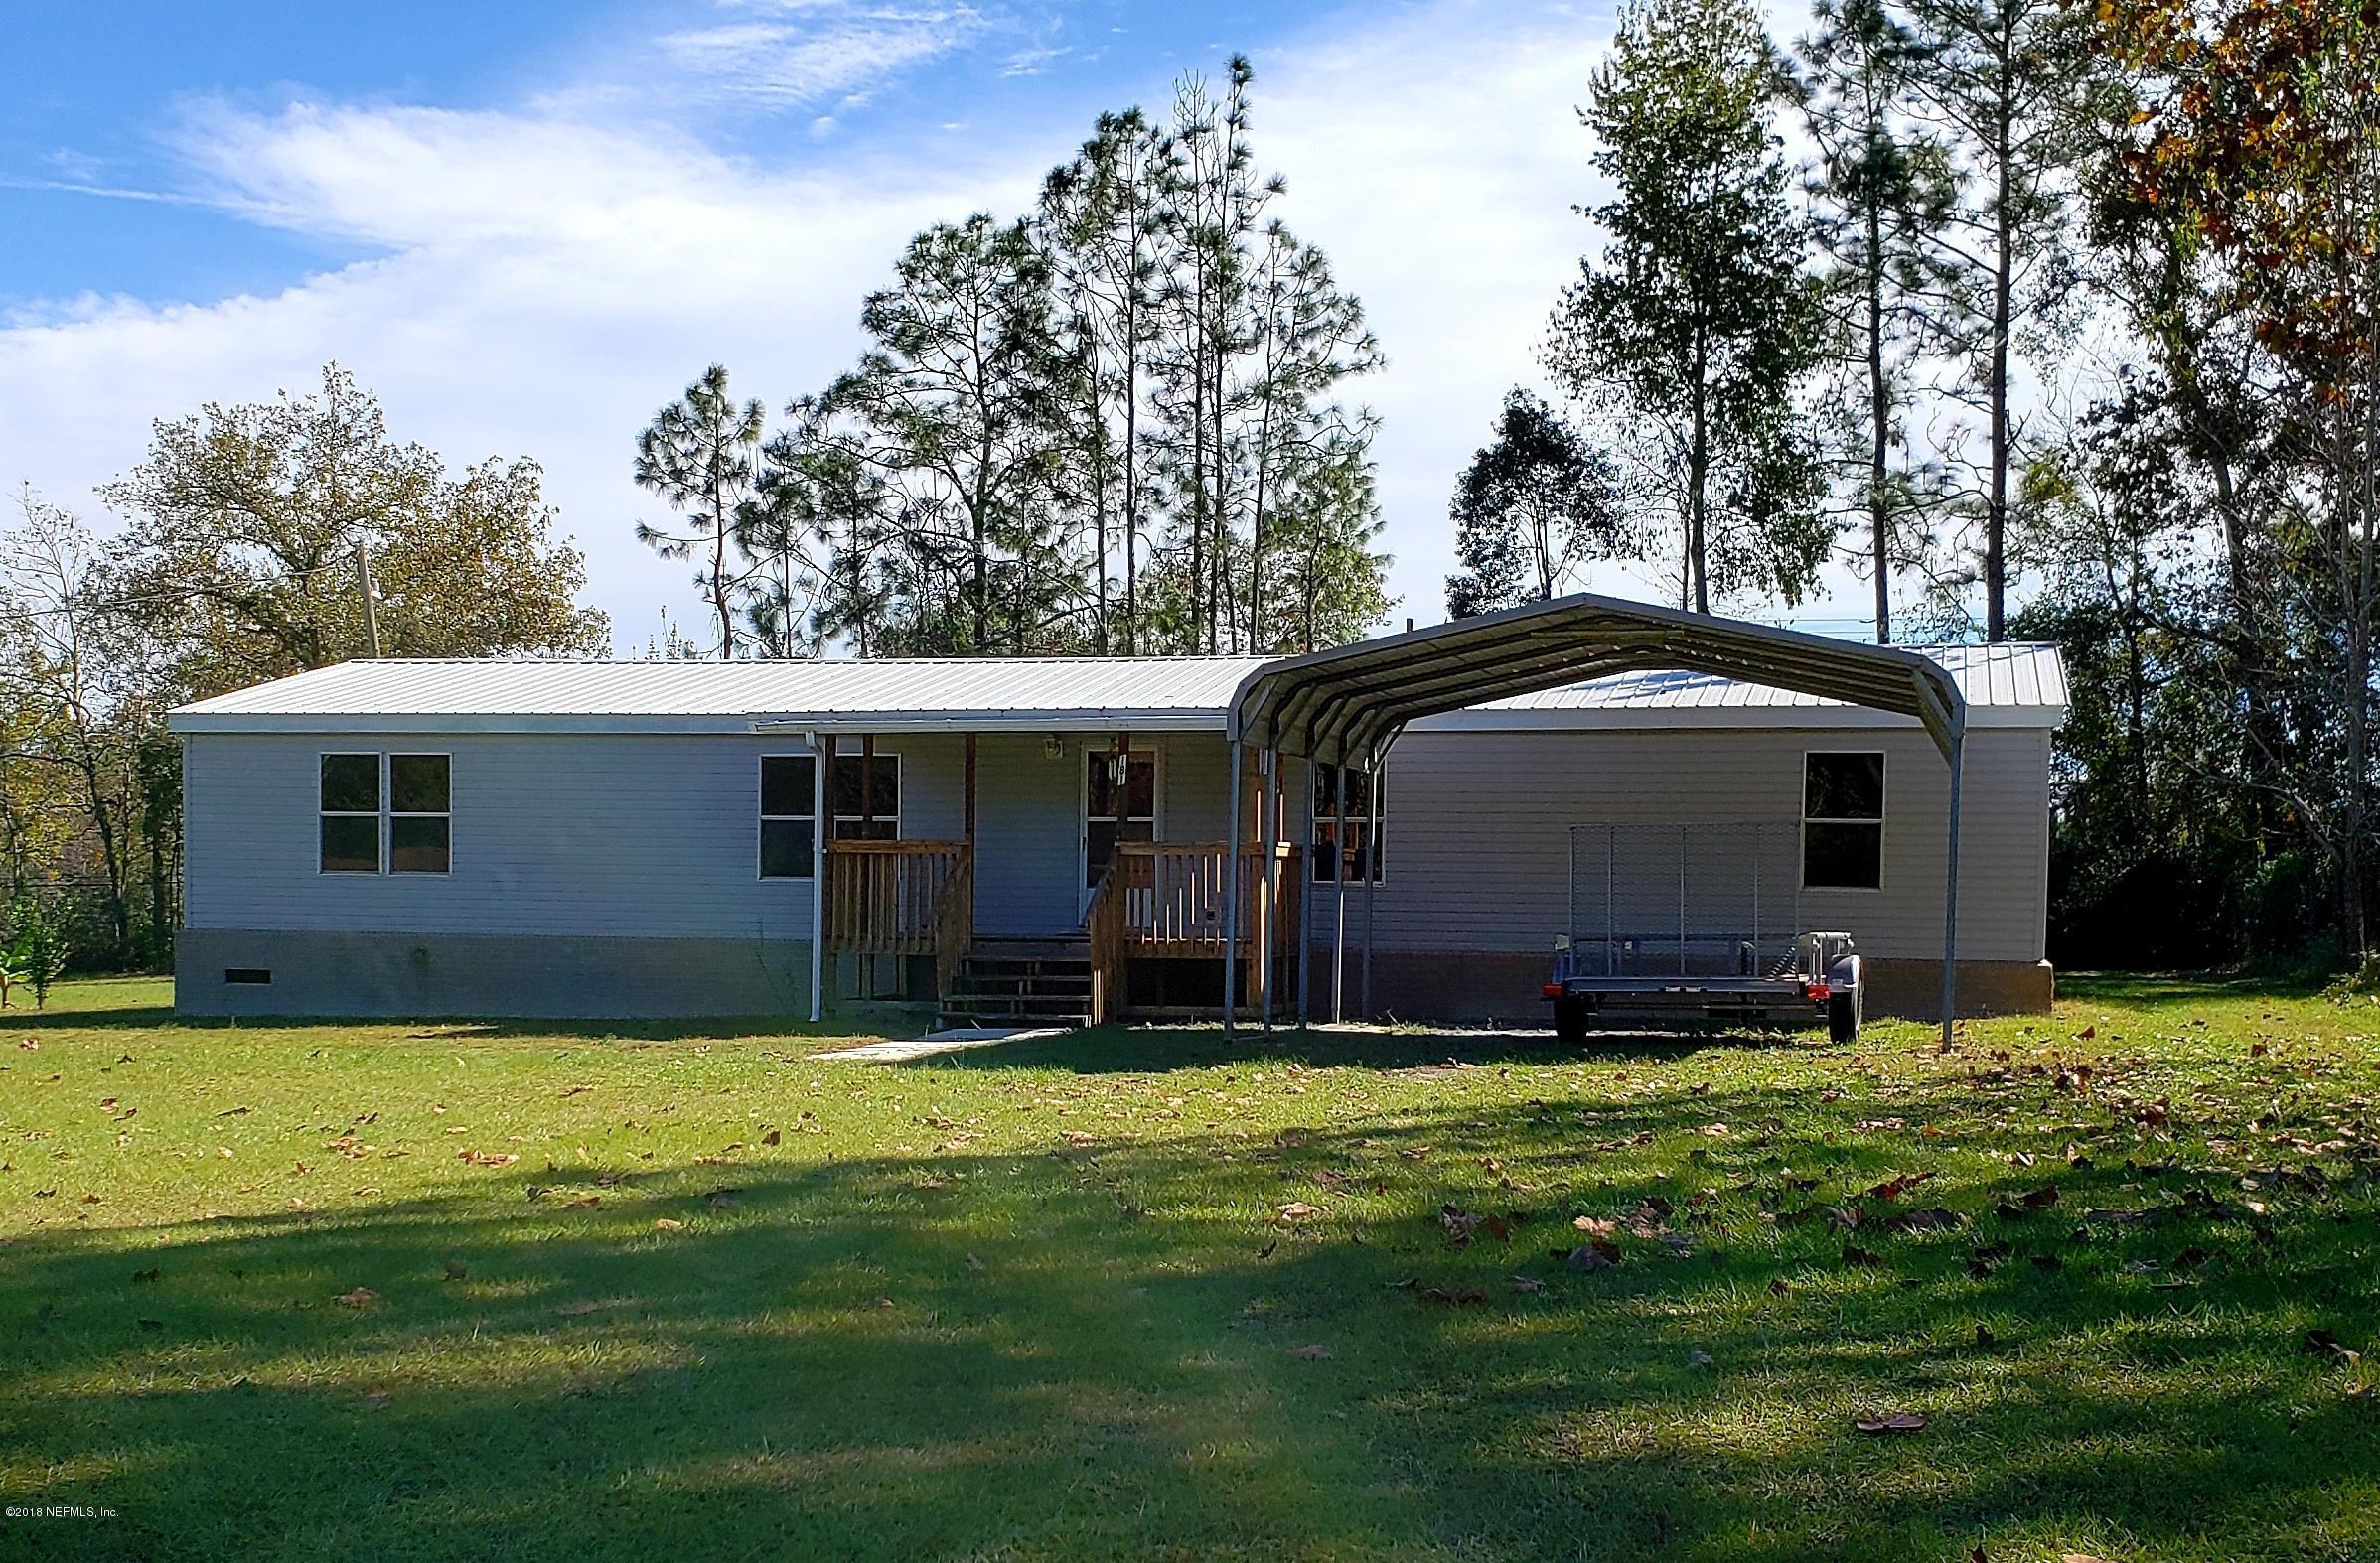 Photo of 181 SONJA ELLEN, JACKSONVILLE, FL 32234